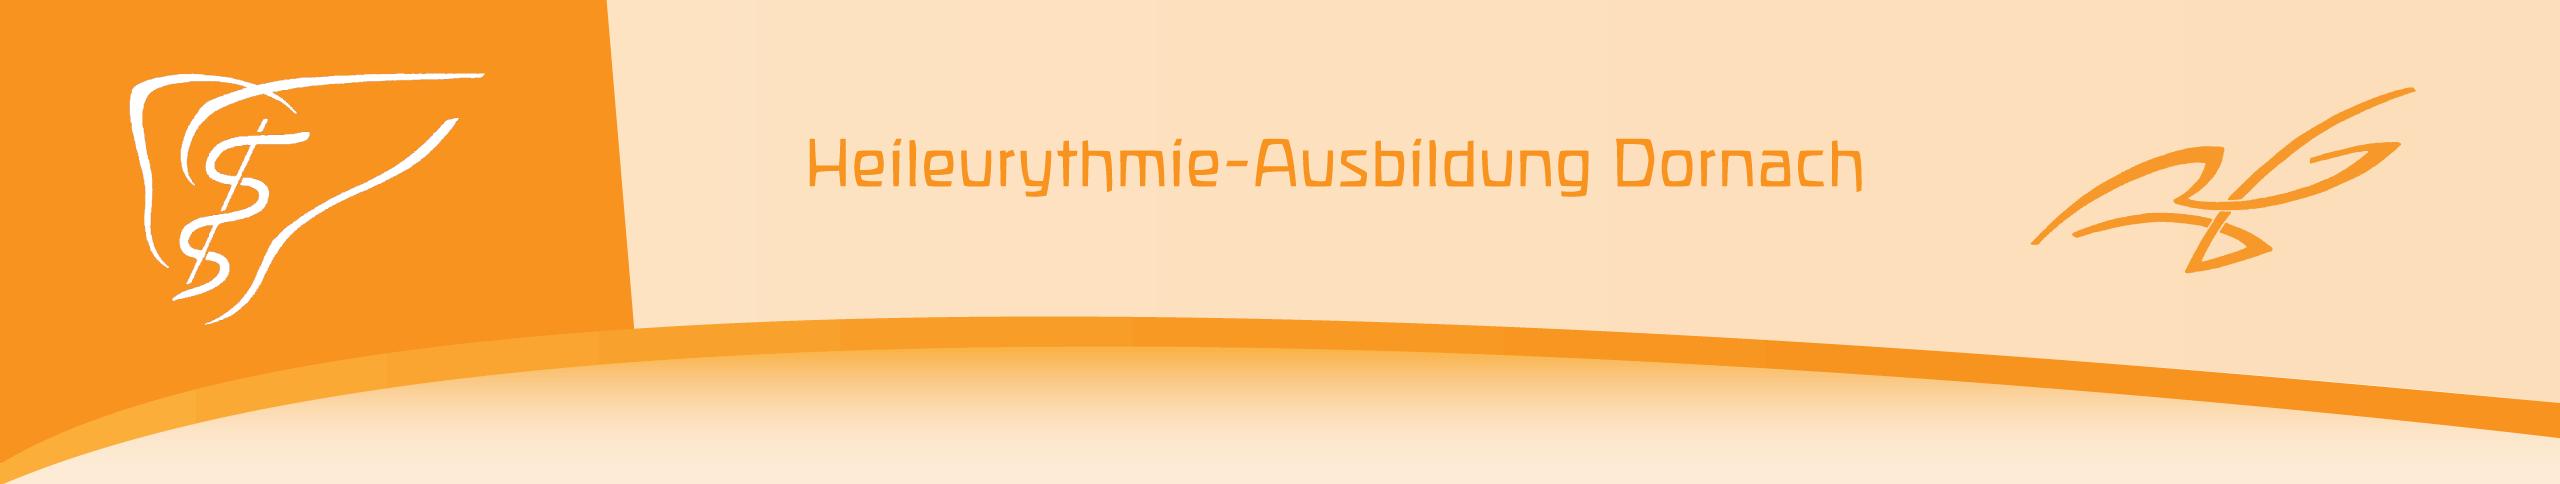 Heileurythmie-Ausbildung Dornach Logo